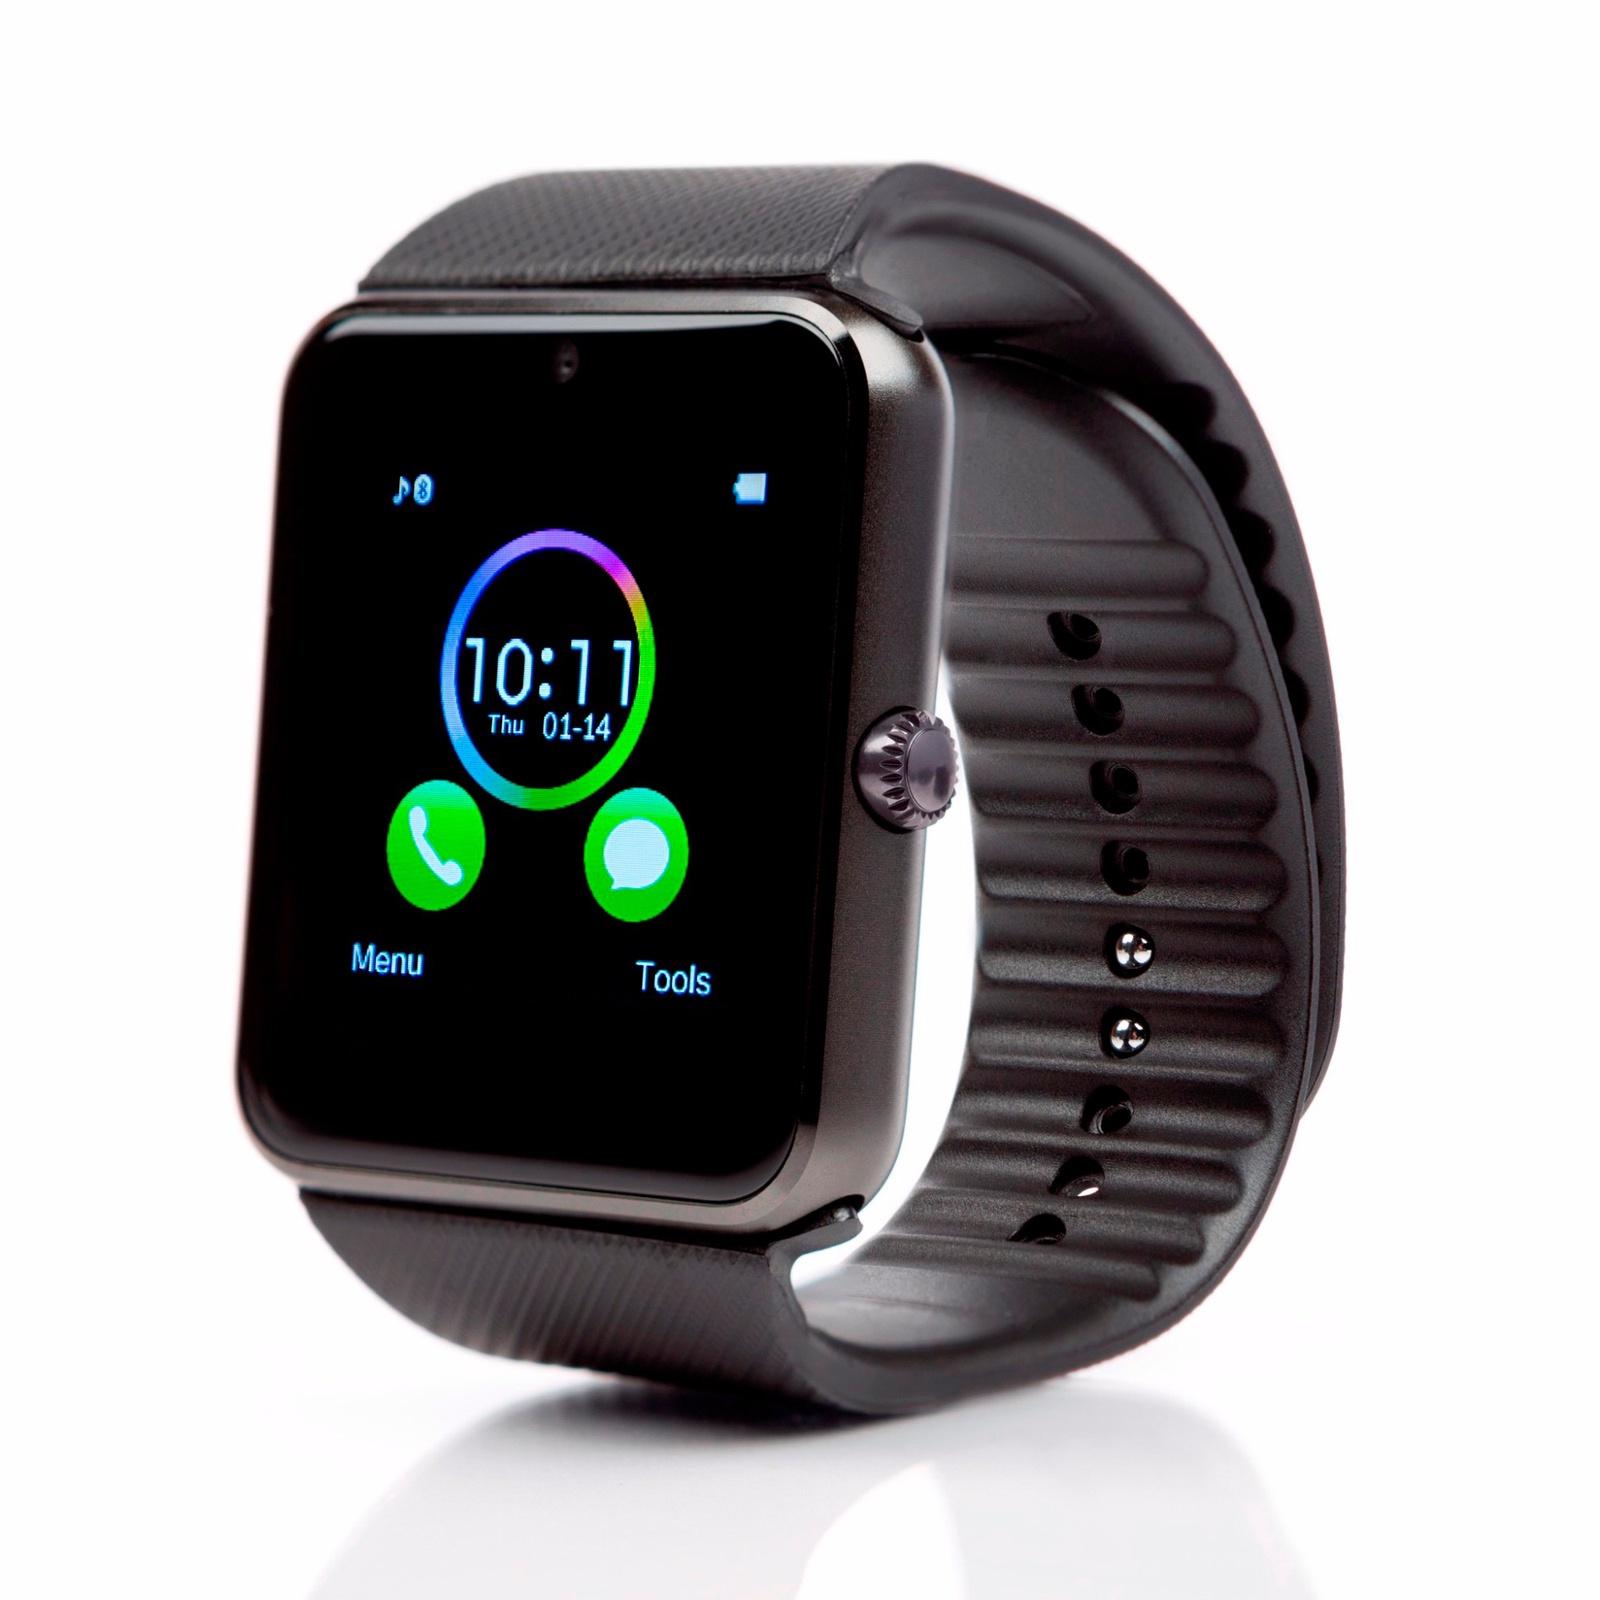 Умные часы Zdk GT08 (Android, IOS, Динамик, Микрофон, SIM, MicroSD, Черный) умные часы zdk gt08 silver